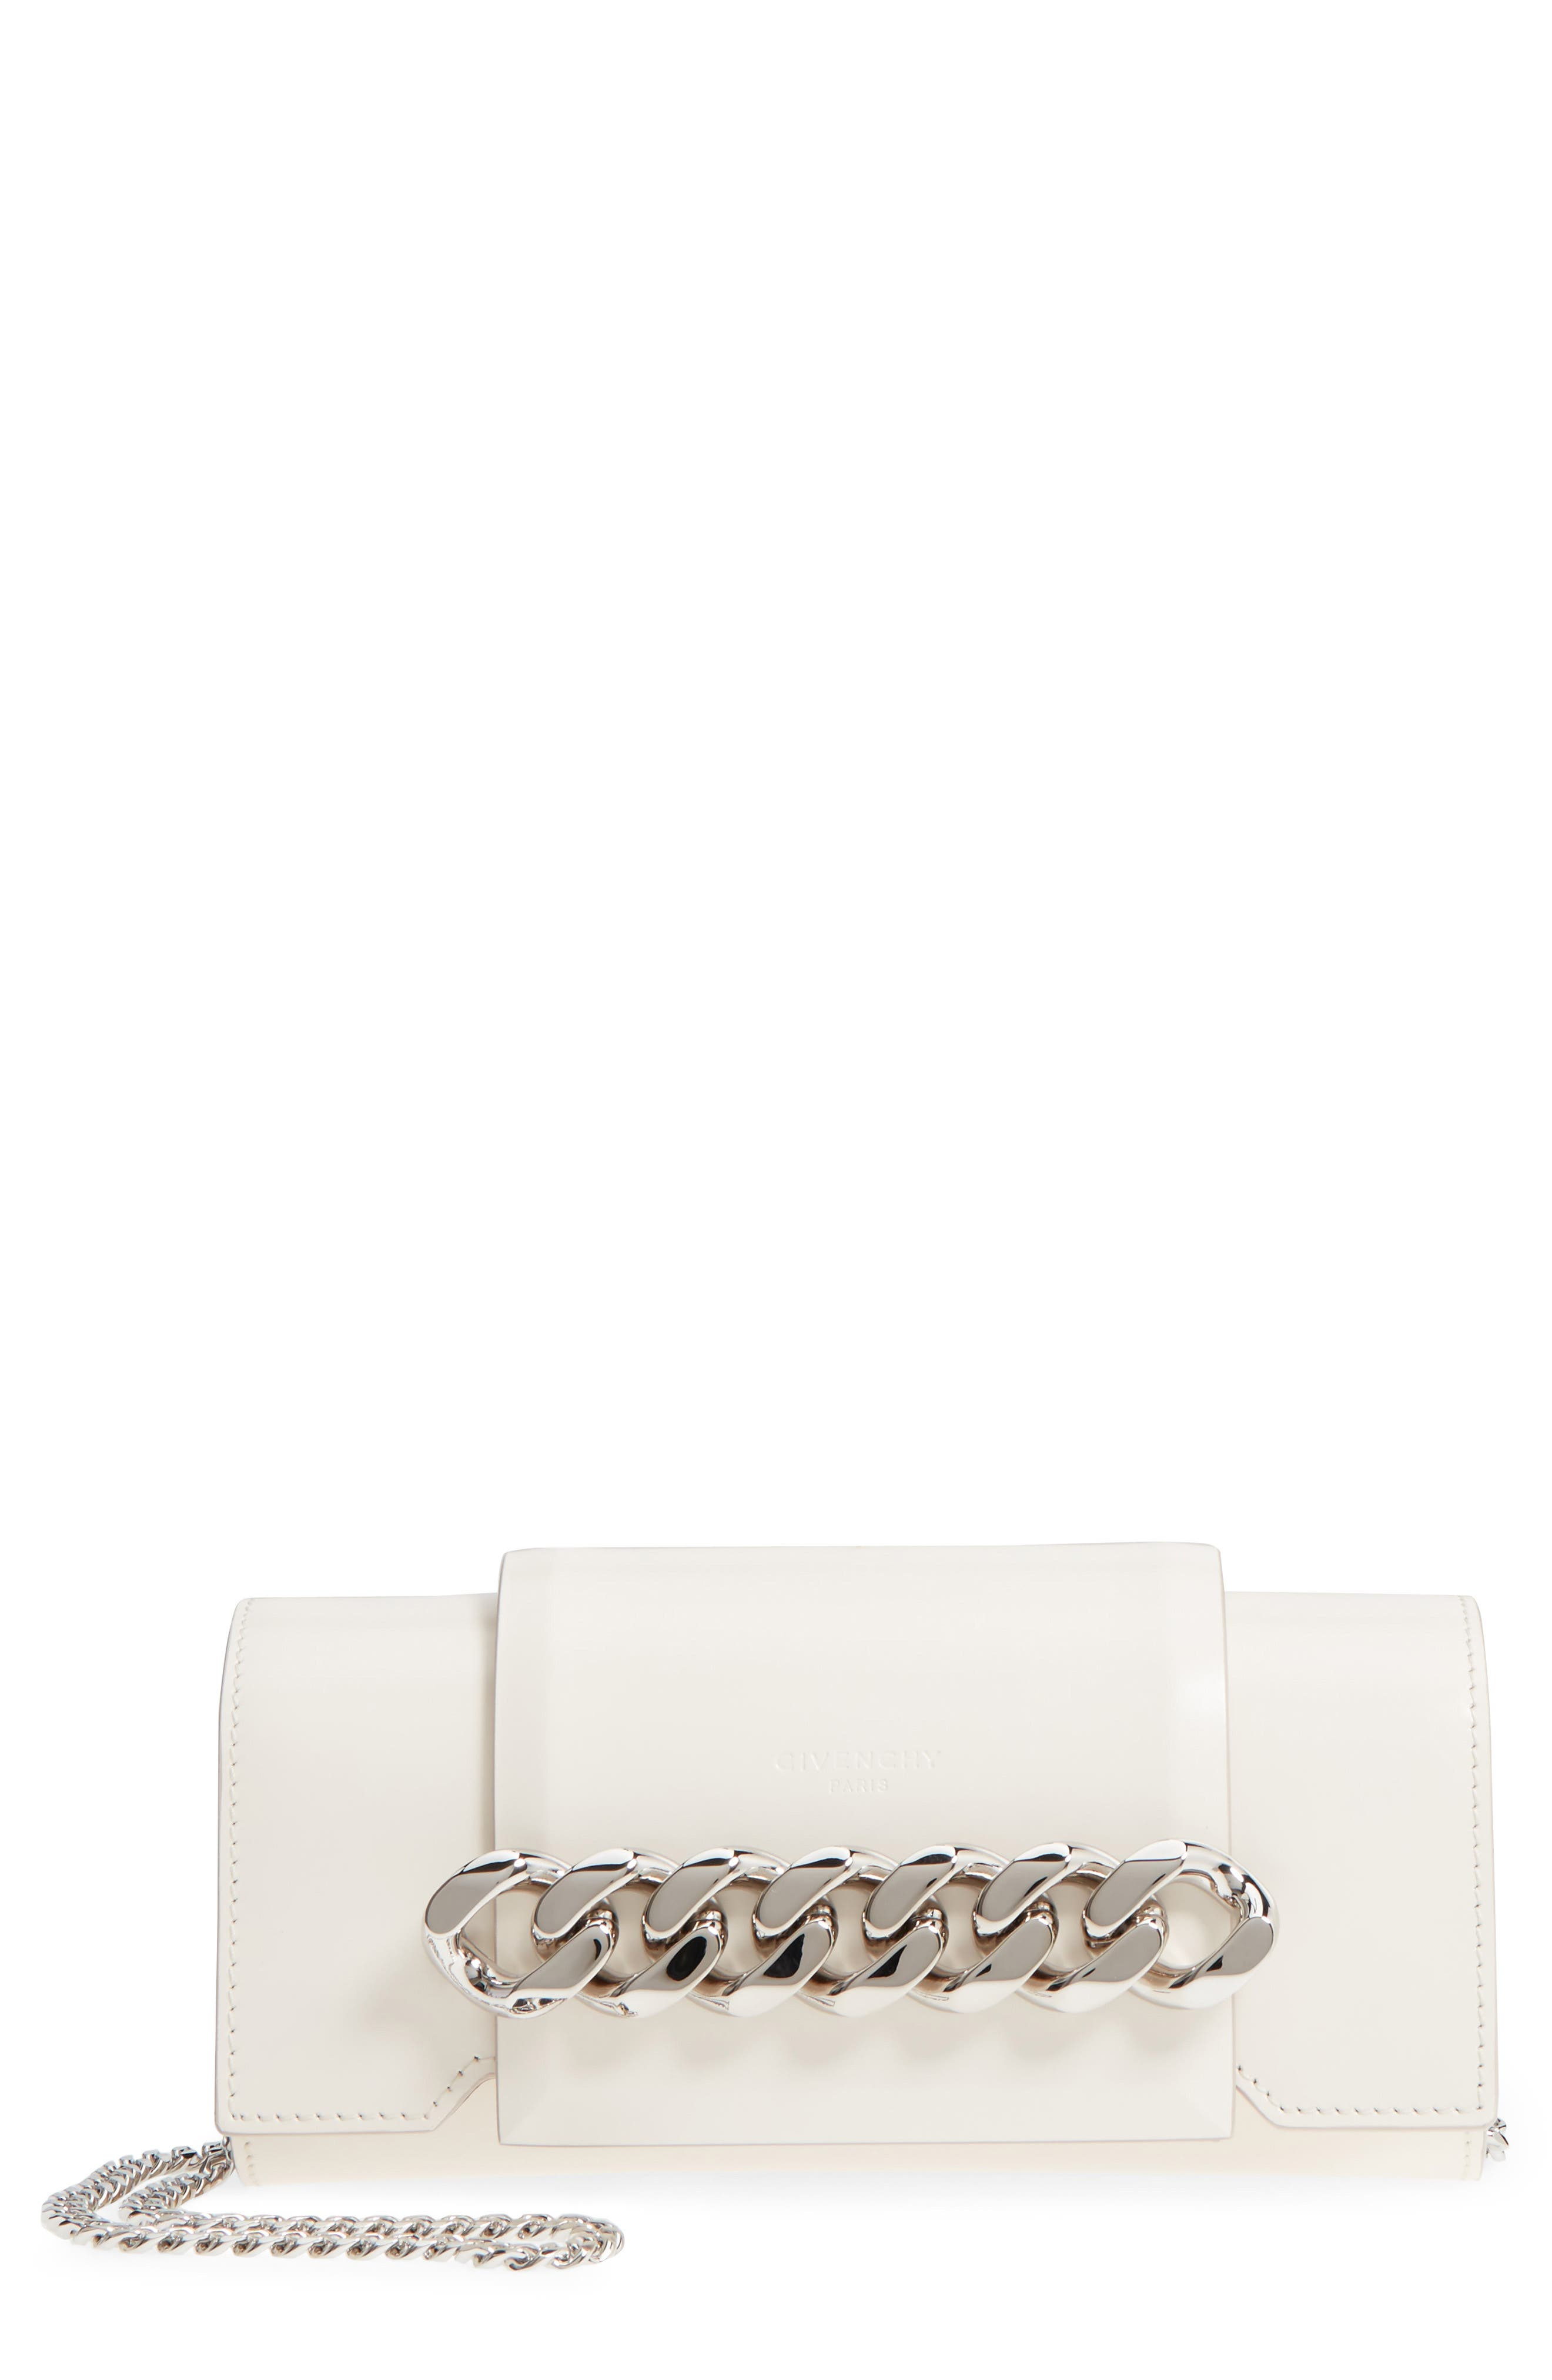 Mini Infinity Calfskin Leather Shoulder/Crossbody Bag,                             Main thumbnail 2, color,